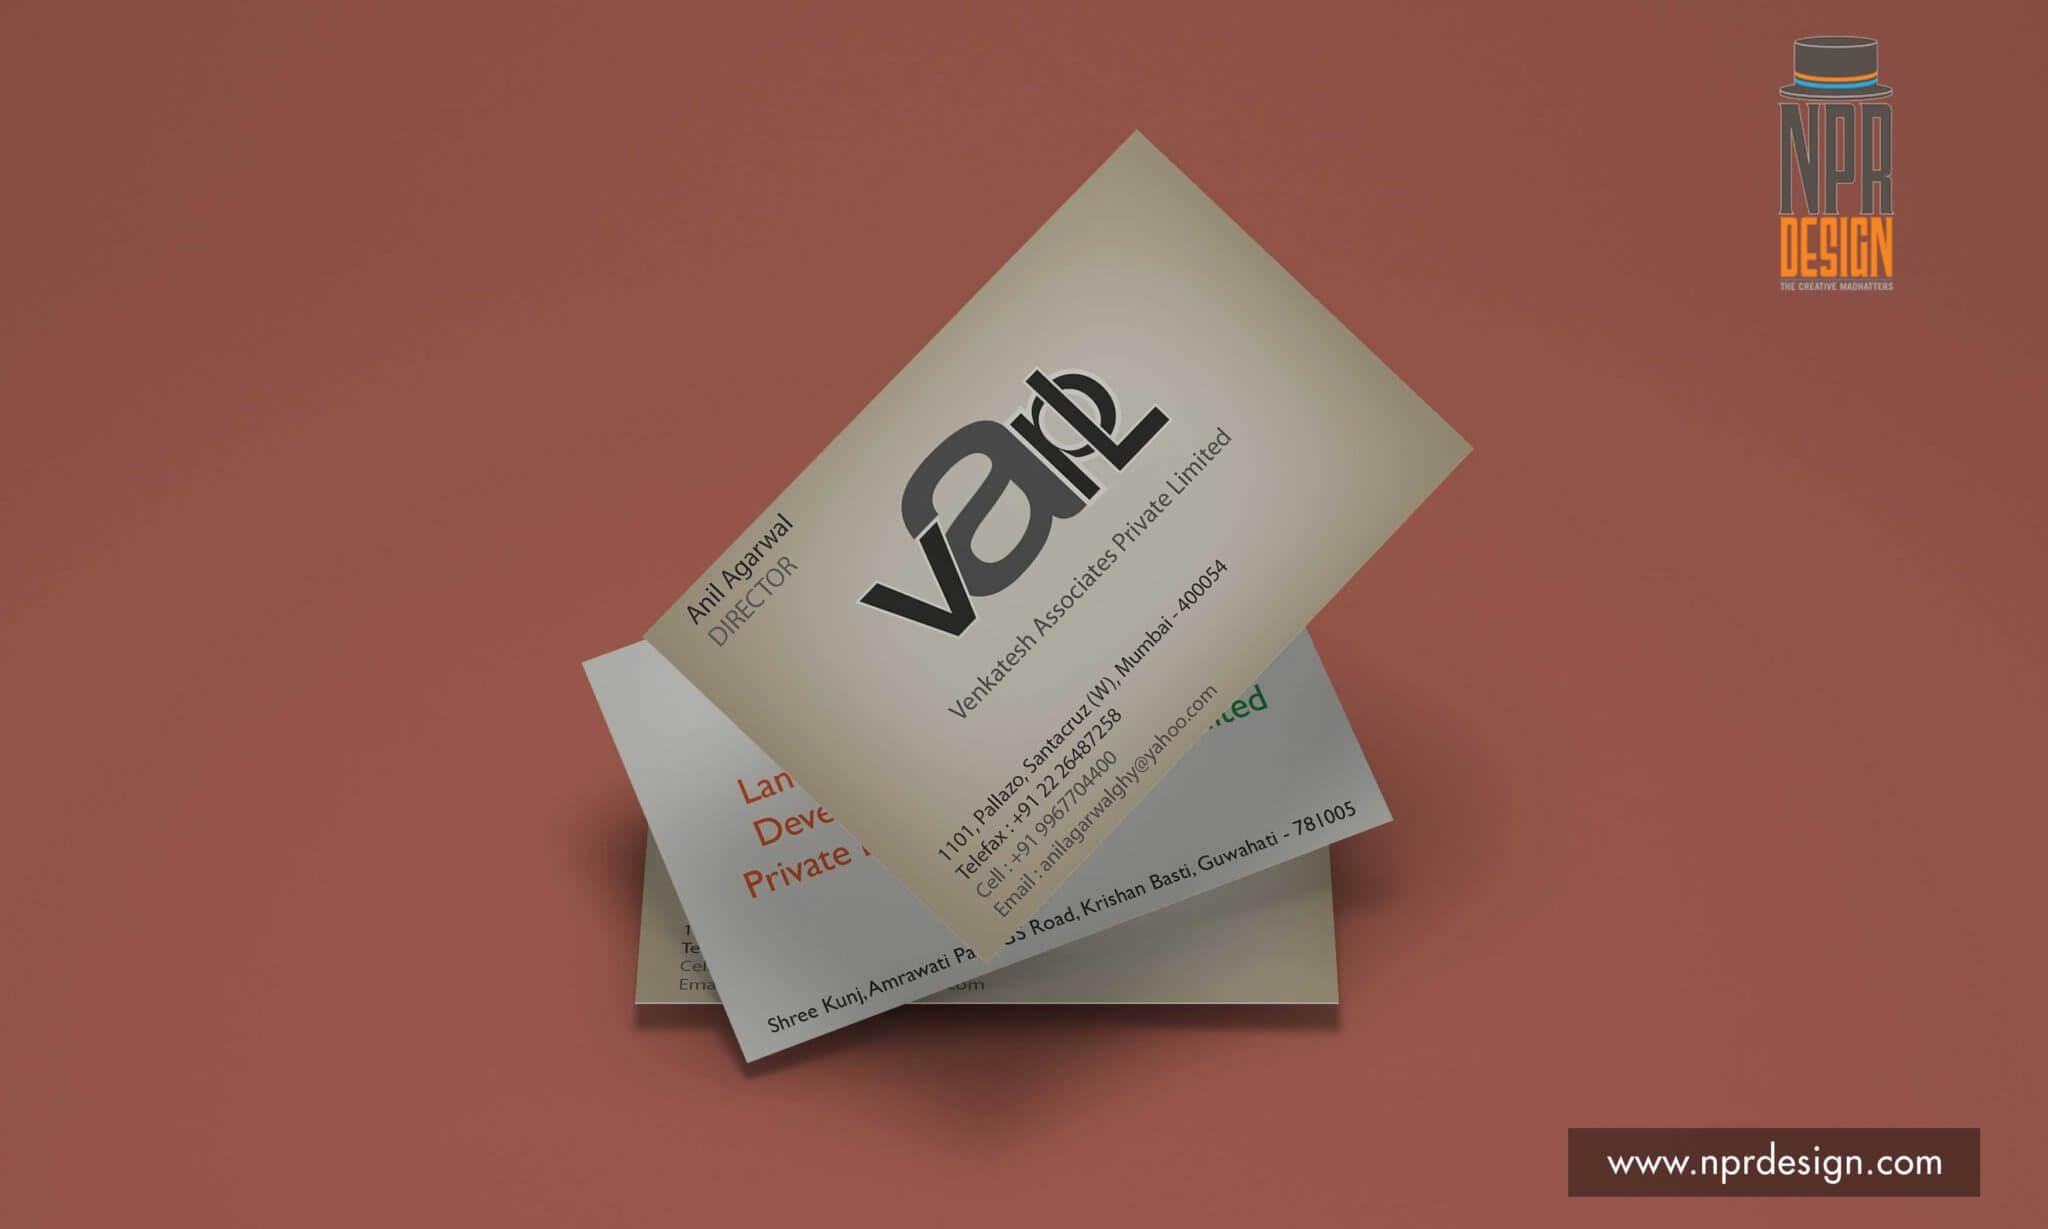 VAPL for NPR Design